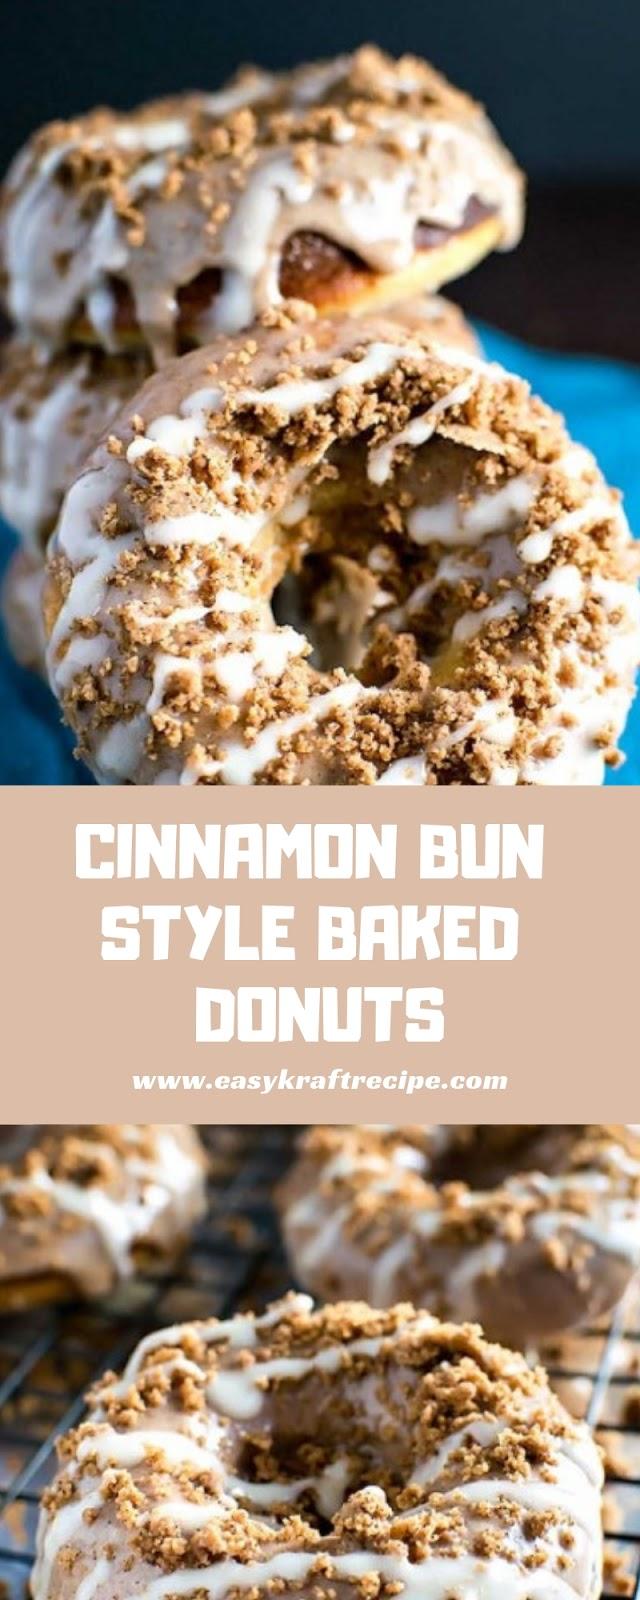 CINNAMON BUN STYLE BAKED DONUTS